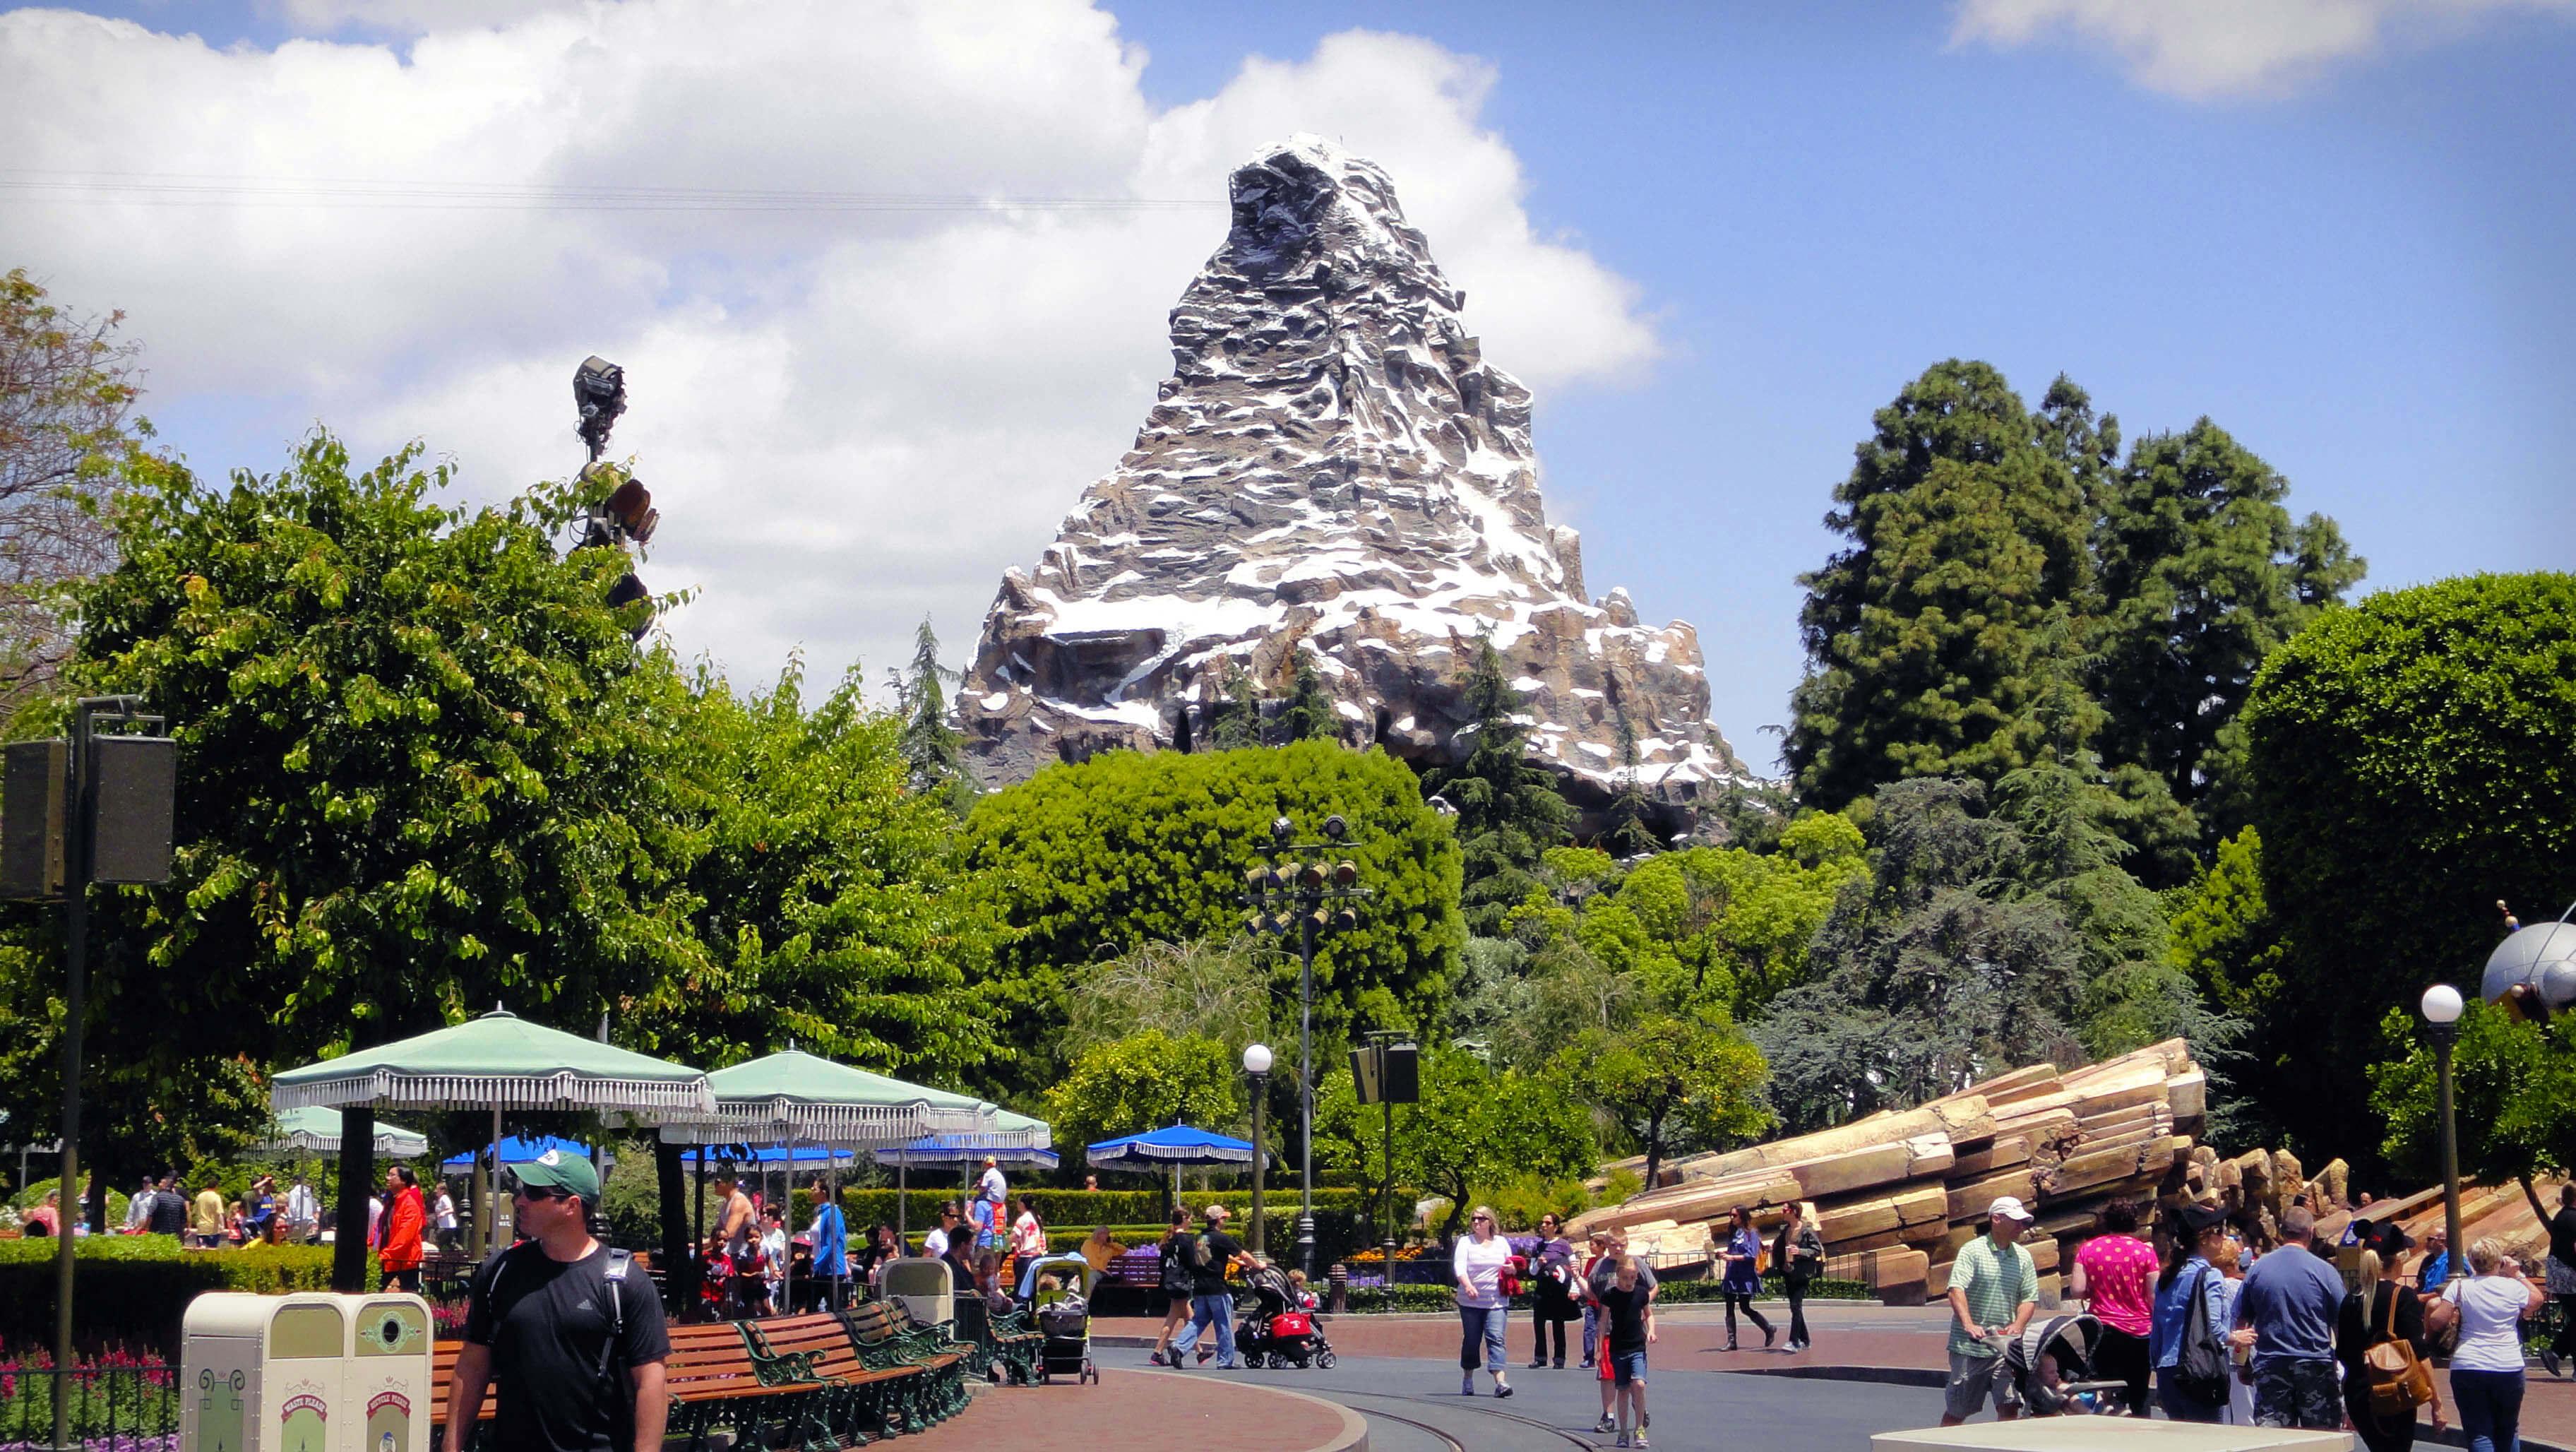 Disneyland's Top Thrill Rides -  Matterhorn Bobsleds